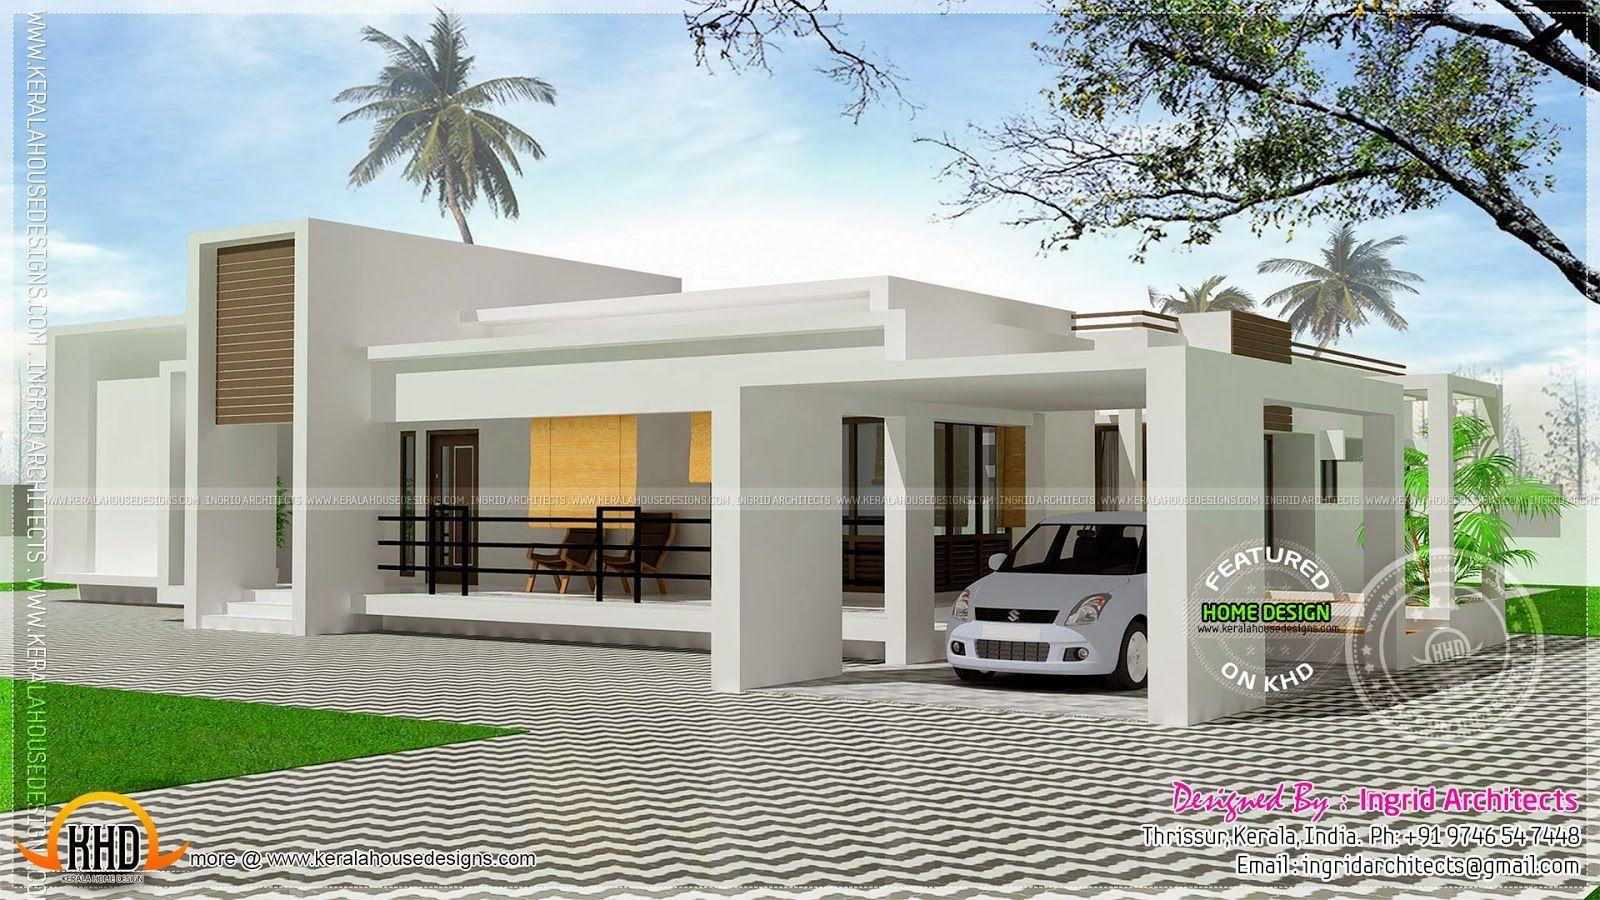 Prodigious cool ideas contemporary house white industrial designntemporary farmhouse rustic color decor also rh pinterest